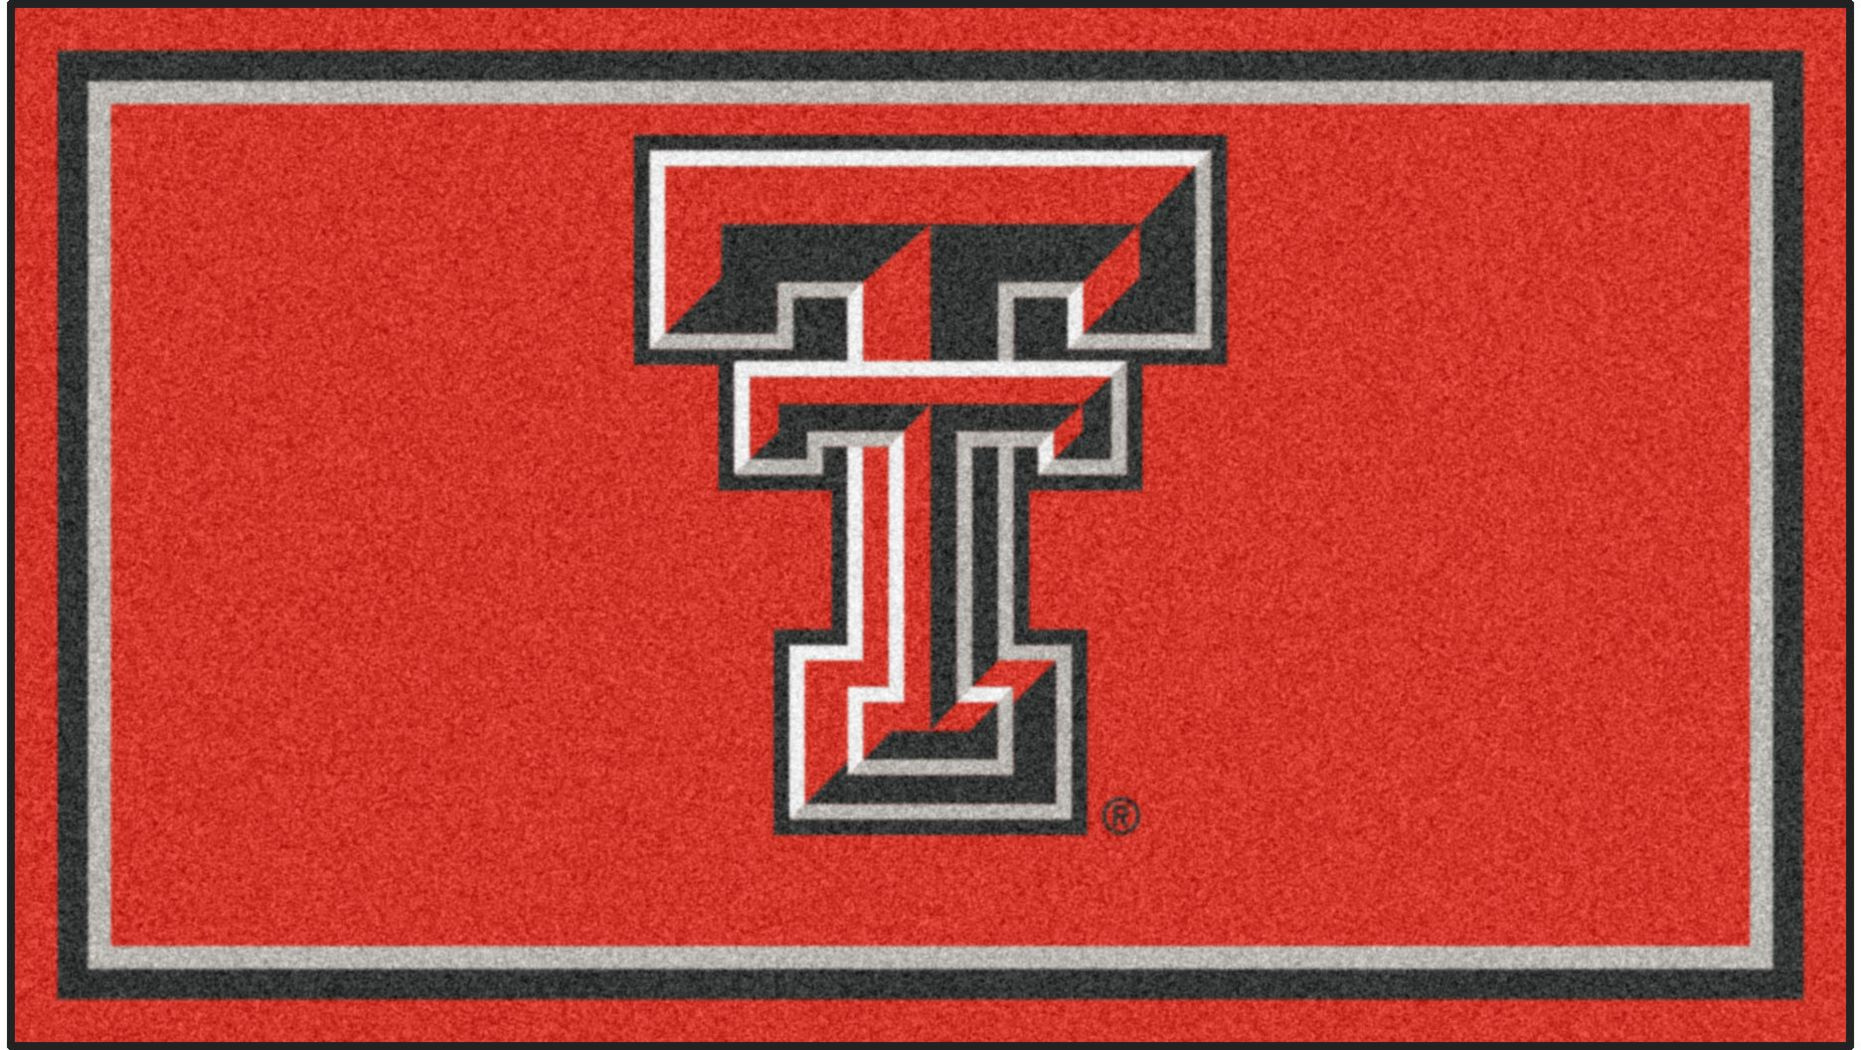 NCAA Big Game Texas Tech University 3' x 5' Rug